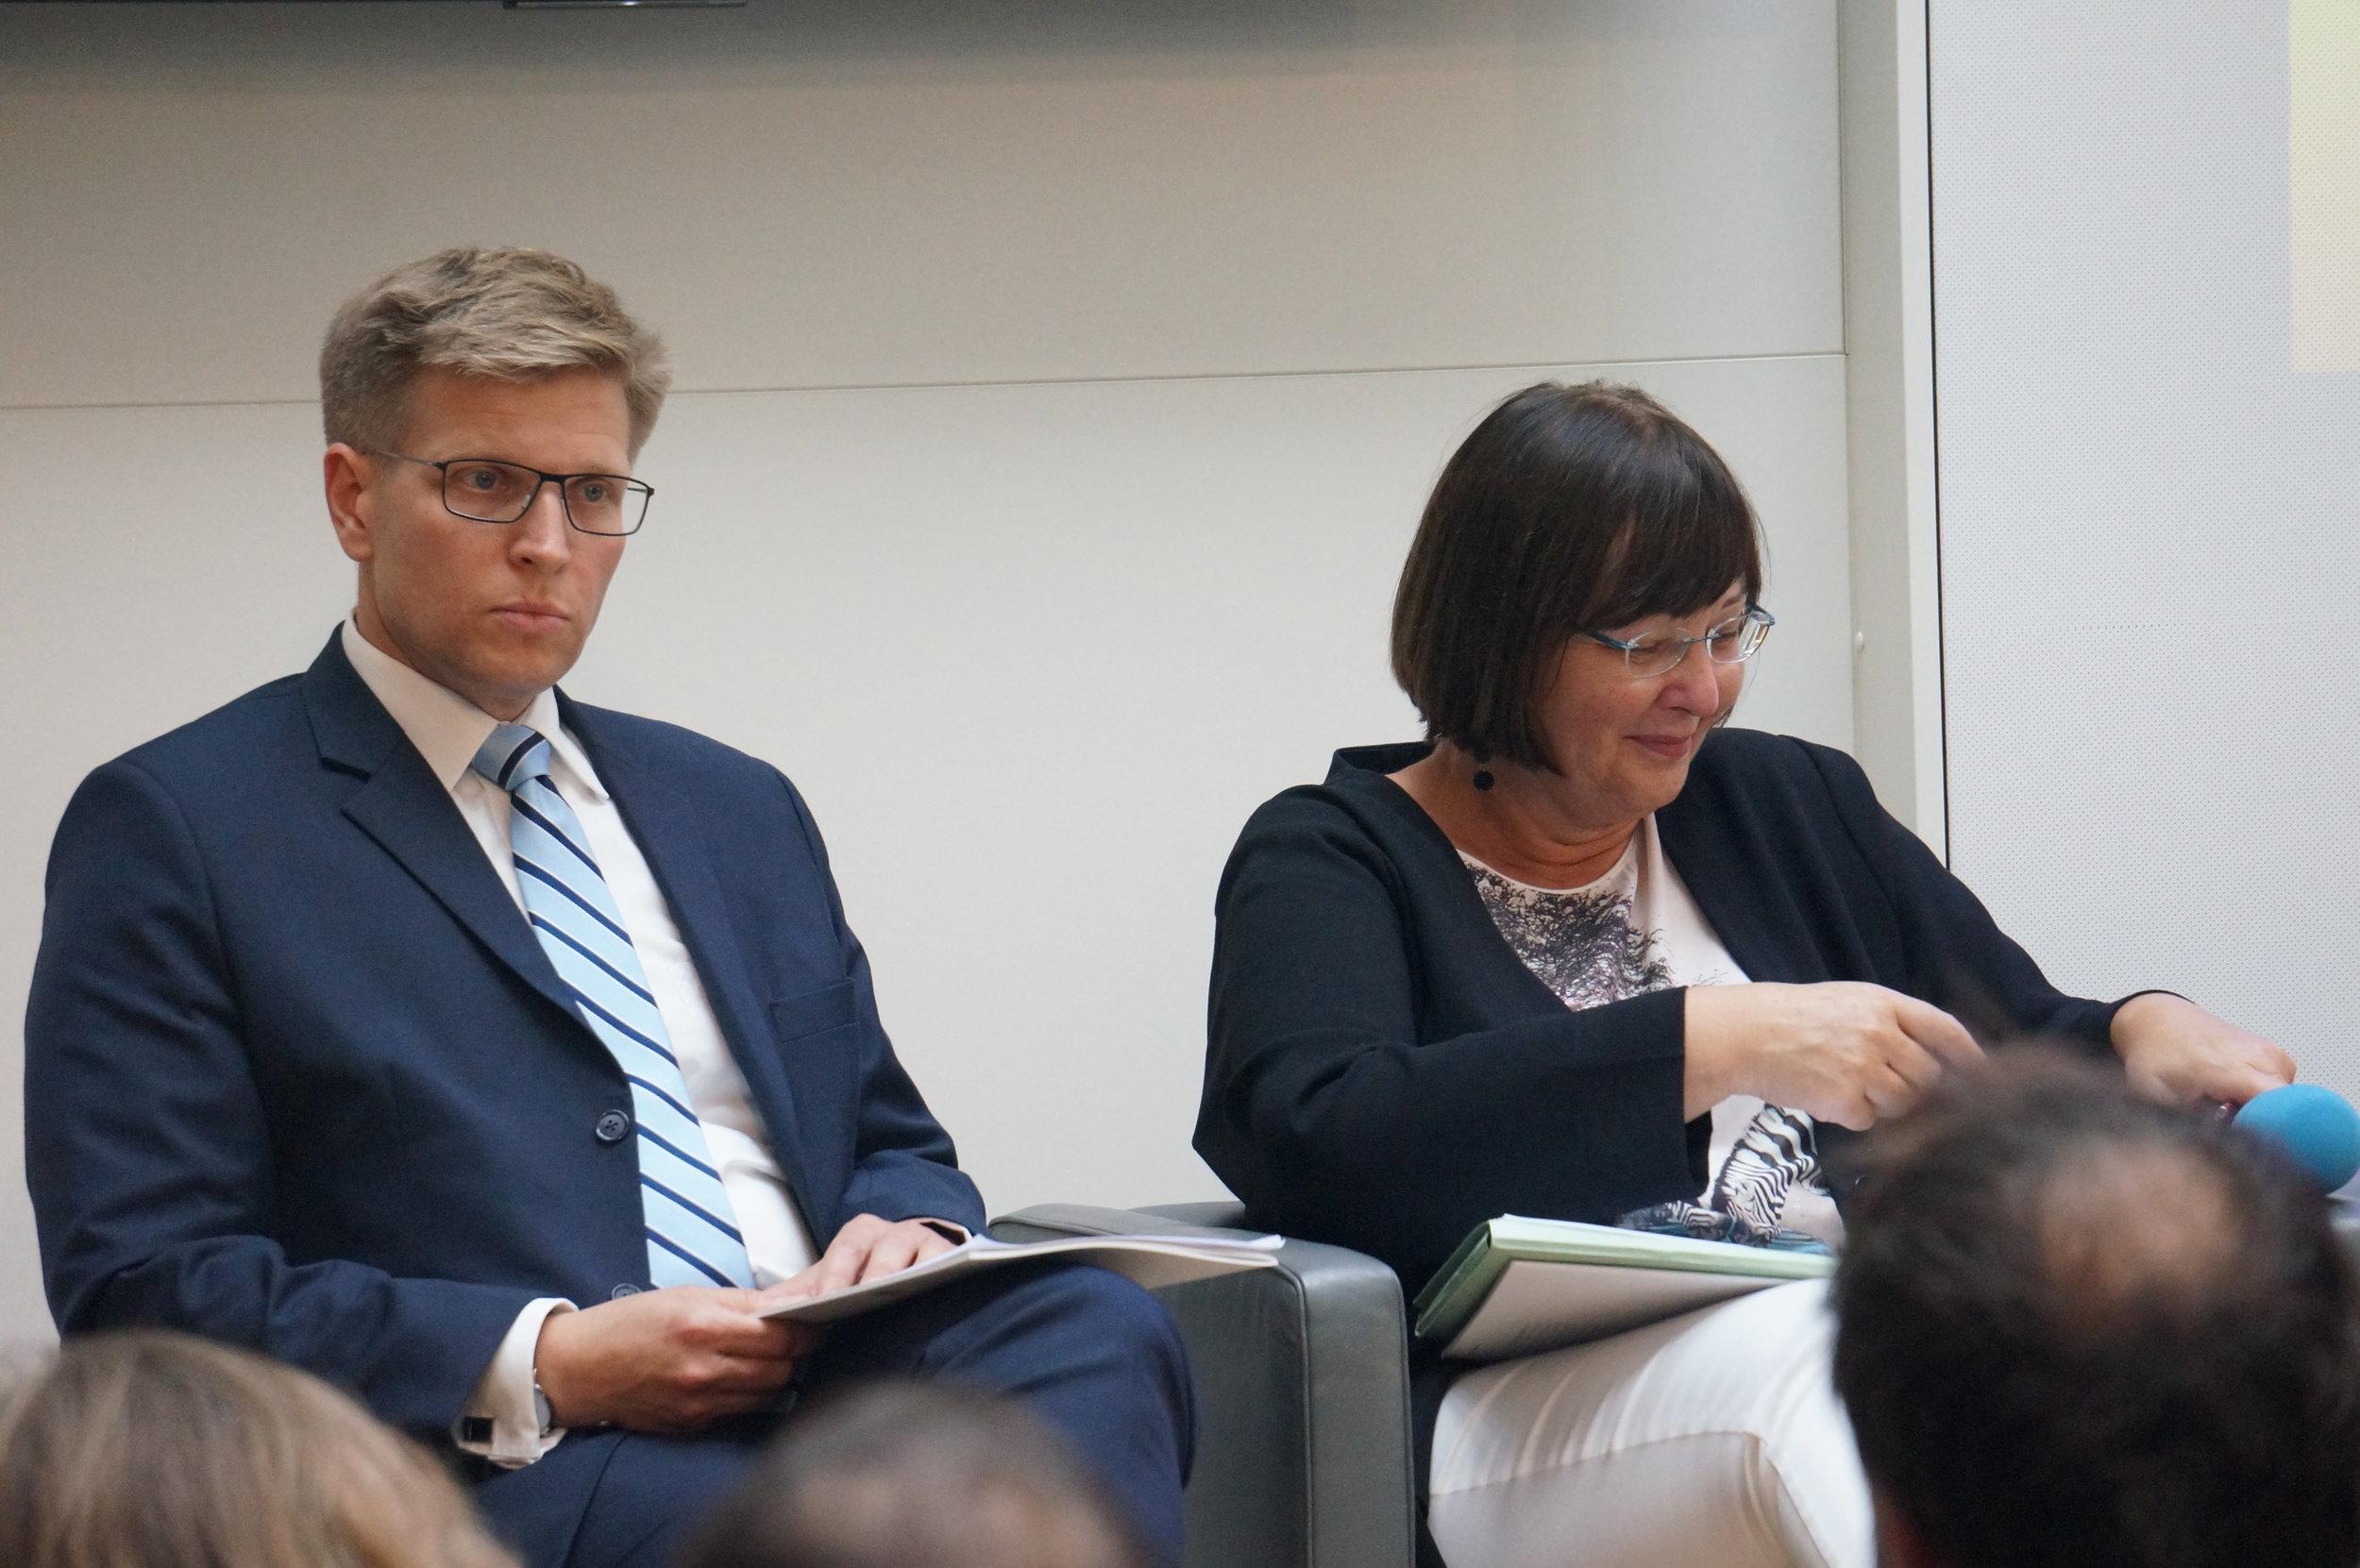 v.li.: Thorsten Lenck und Angela Köppl